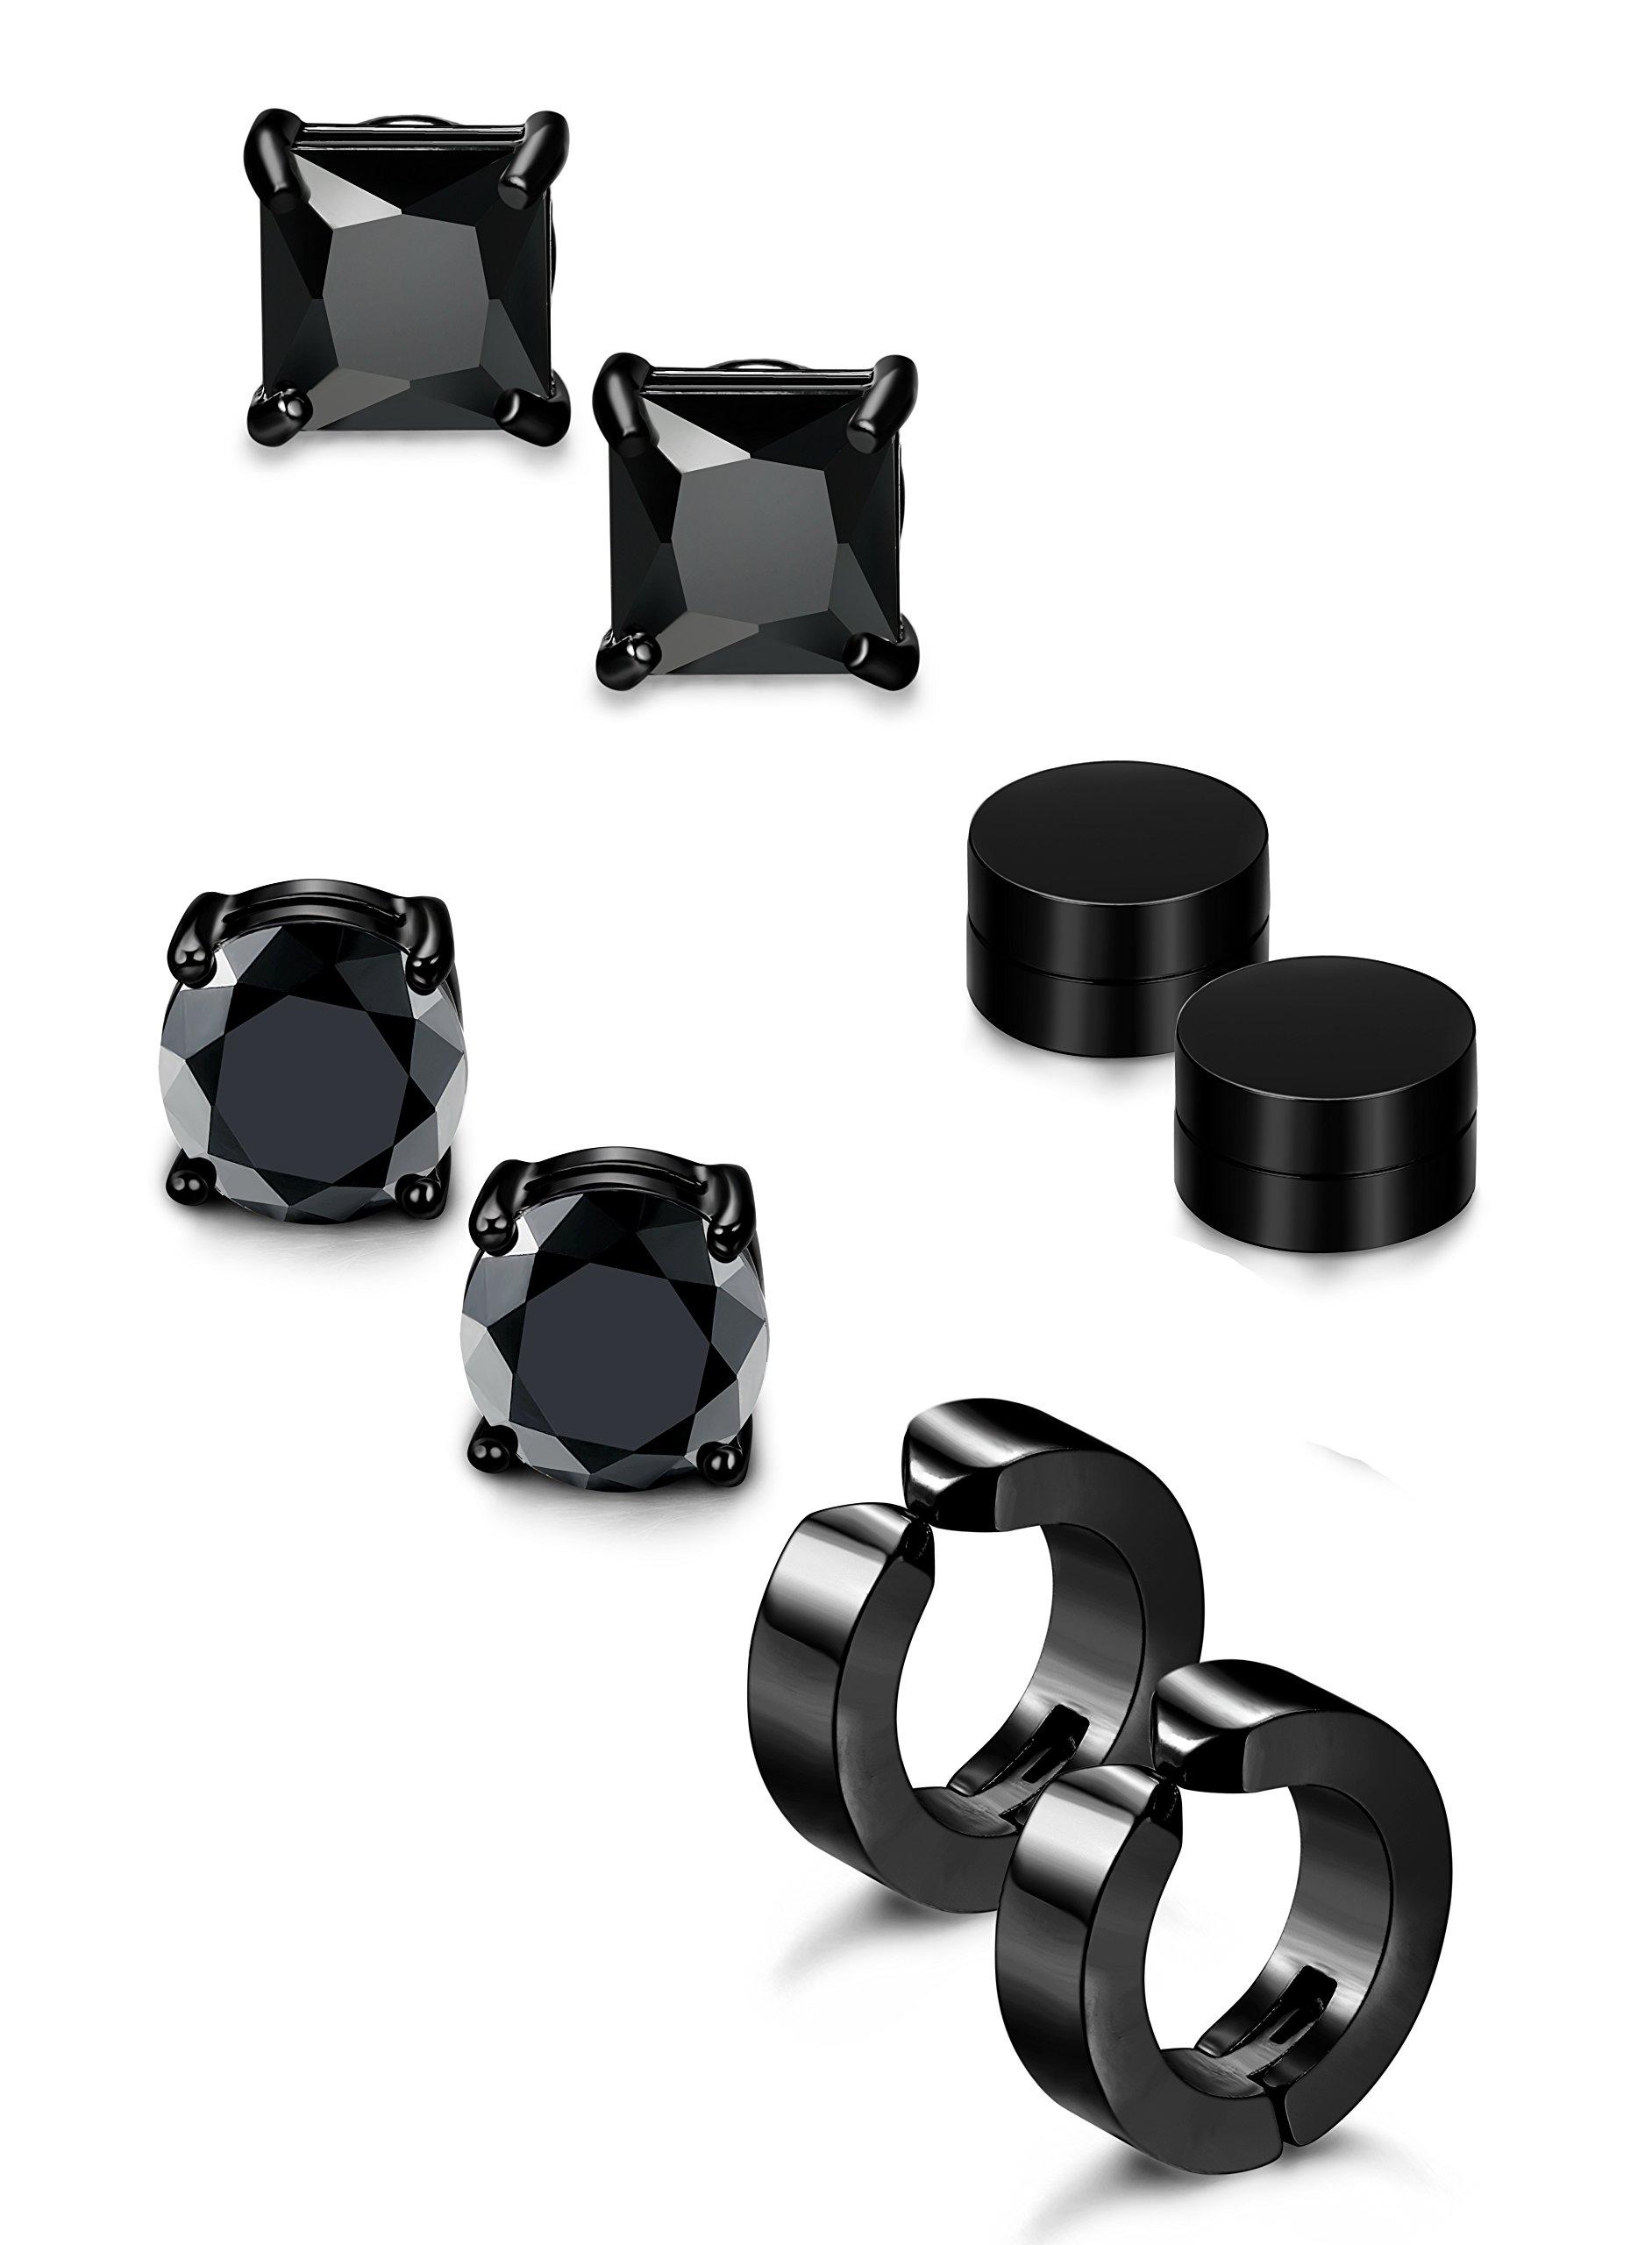 Jstyle 4 Pairs Stainless Steel Stud Earrings for Men Women Magnetic Stud Earrings Non-piercing CZ 5mm B